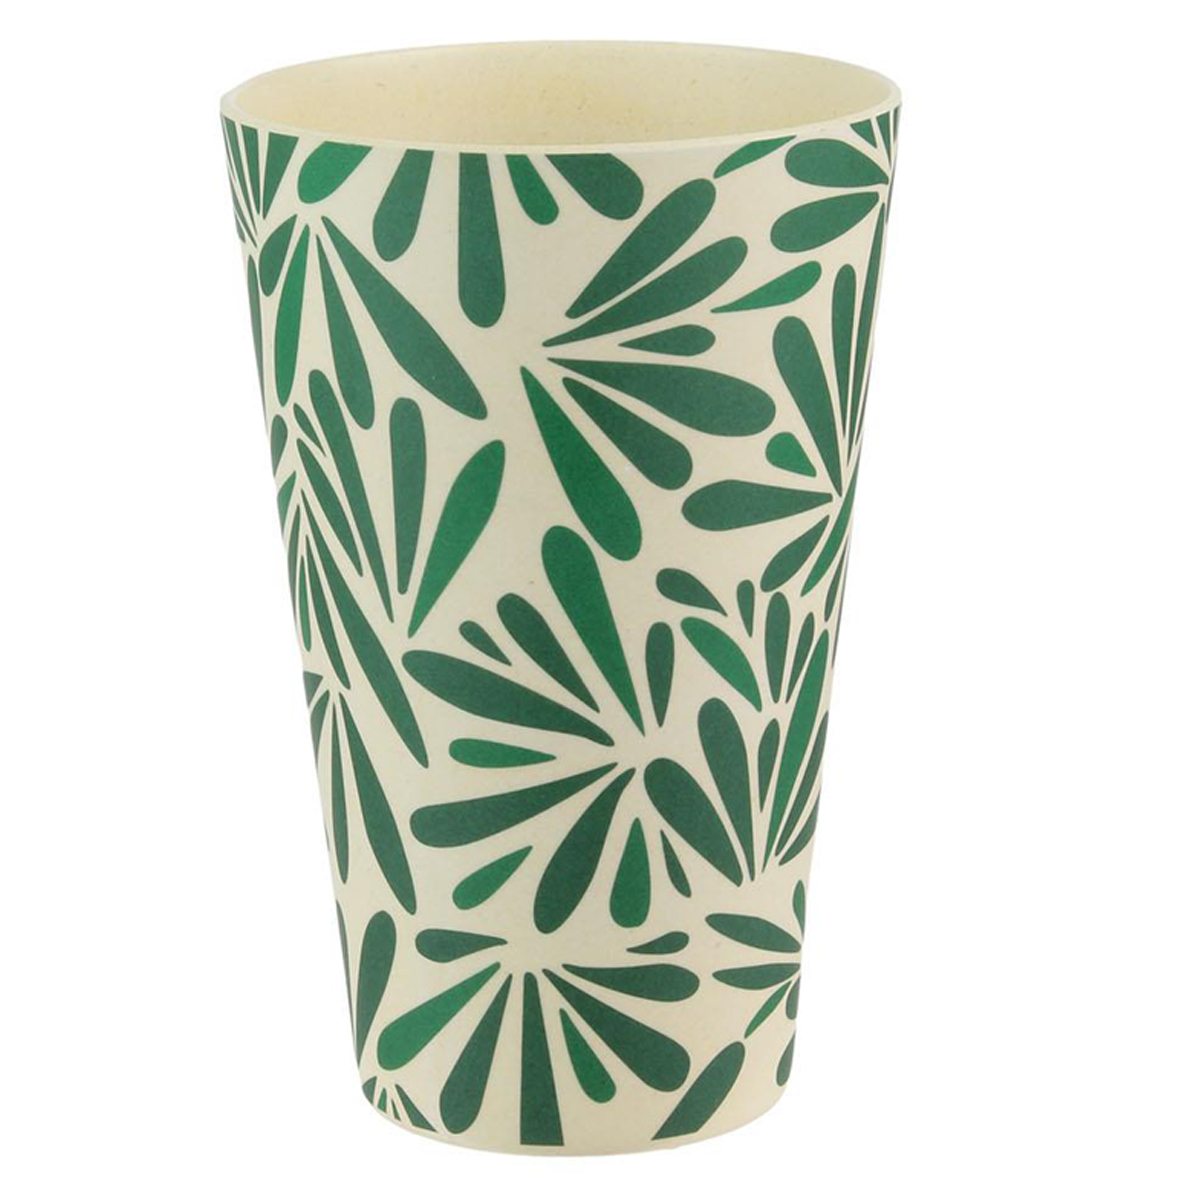 Gobelet verre bambou \'Jungle\' vert beige - 13x8 cm (435 ml) - [Q7759]